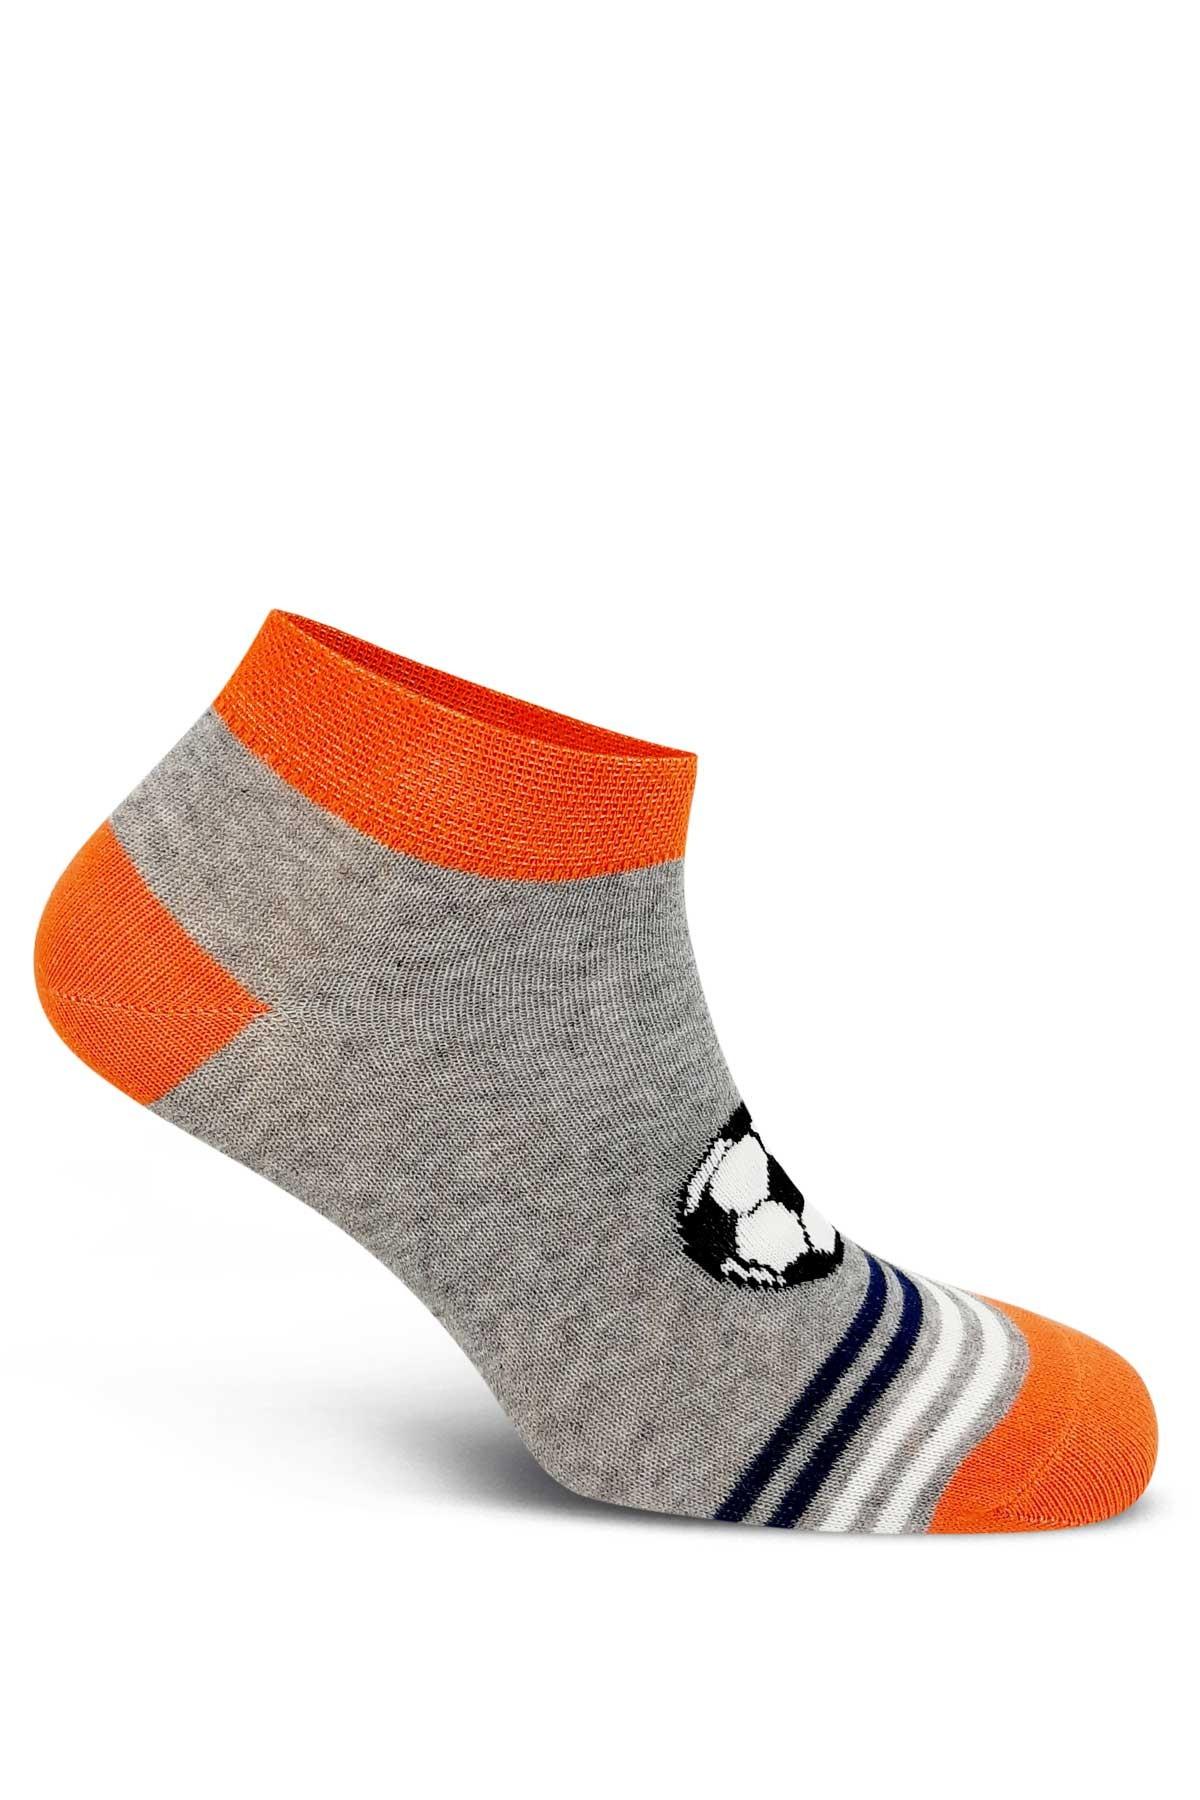 First Erkek Çocuk Patik Çorap Futbol Topu 3 lü - Asorti - 11 - Thumbnail